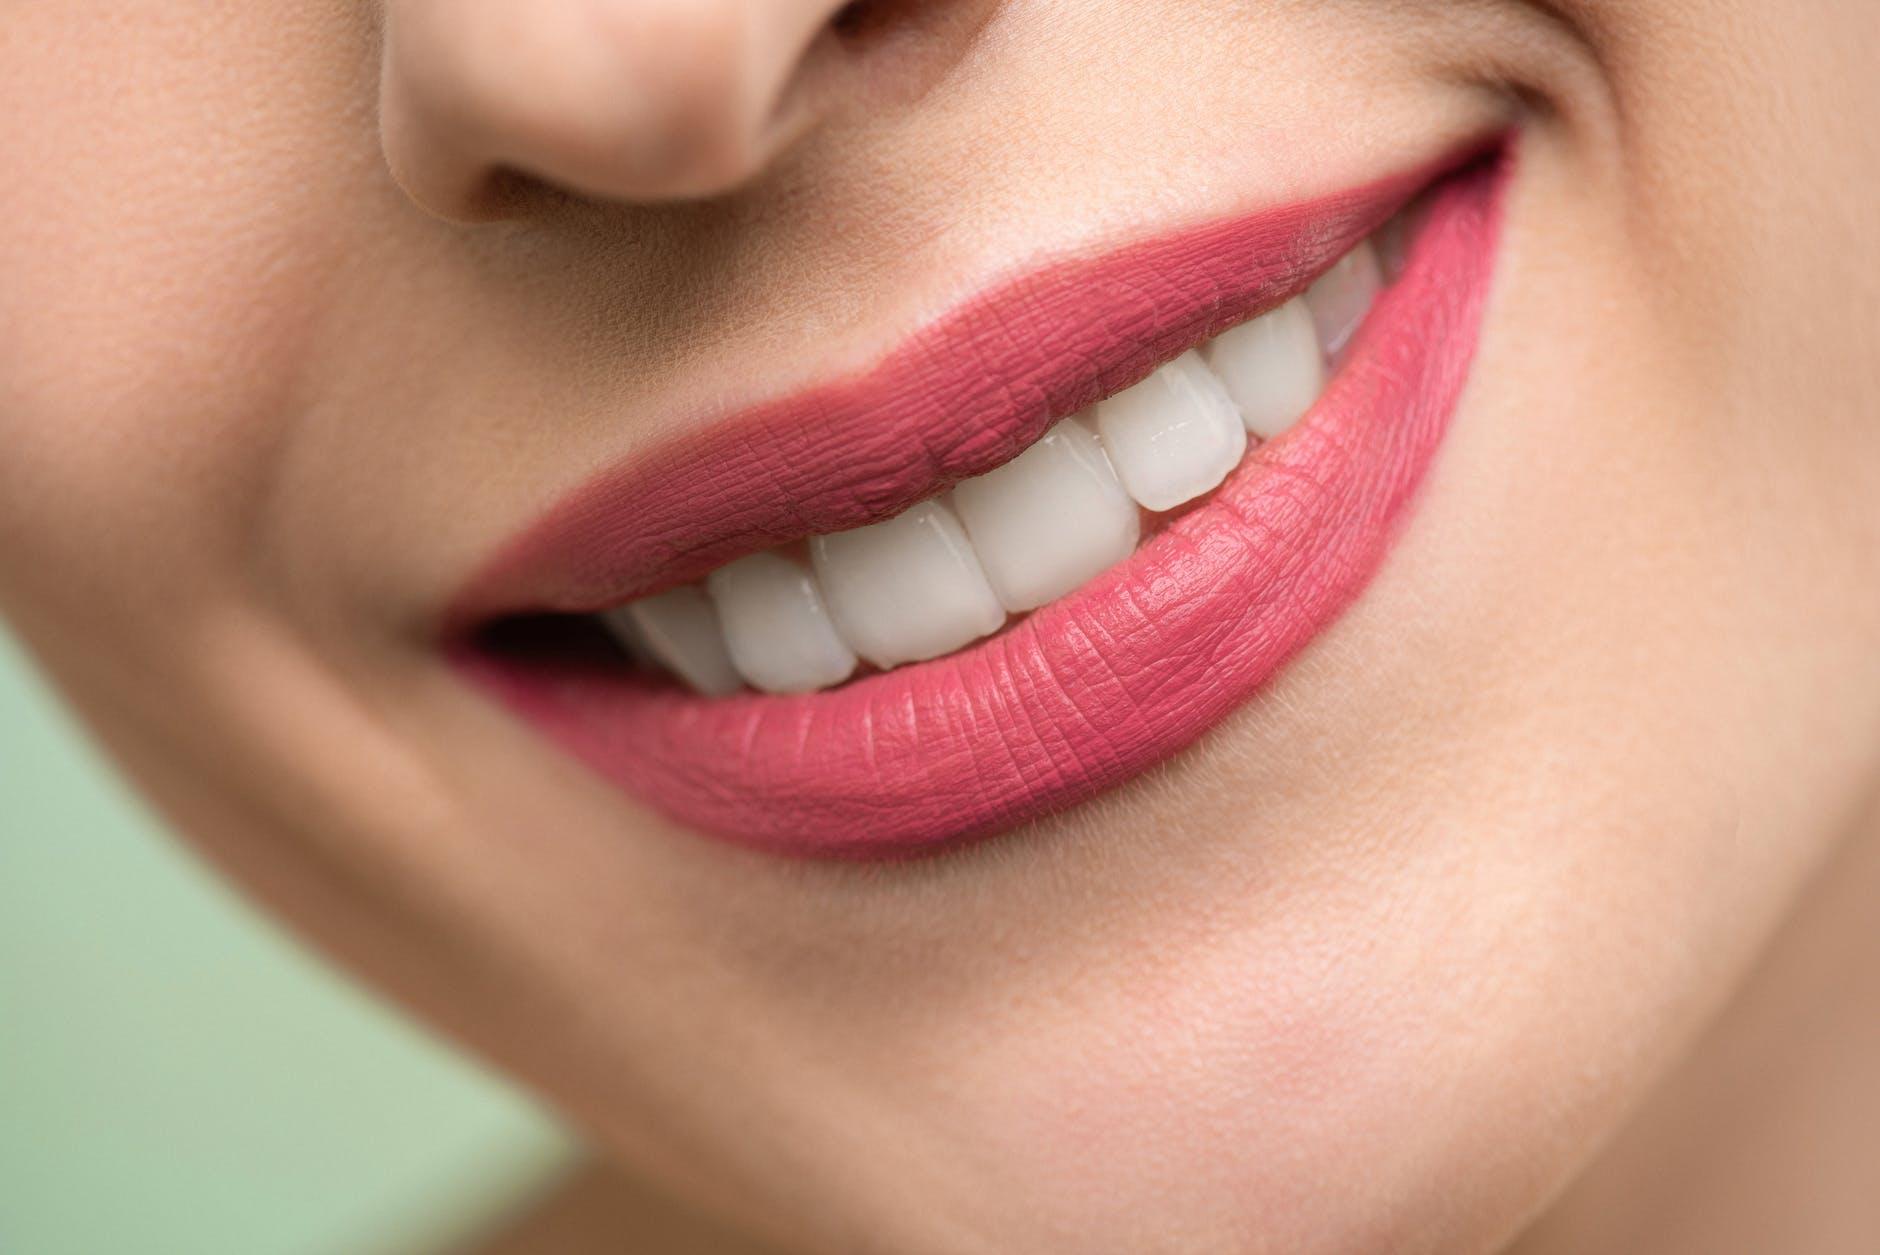 Teeth Cavity-Free